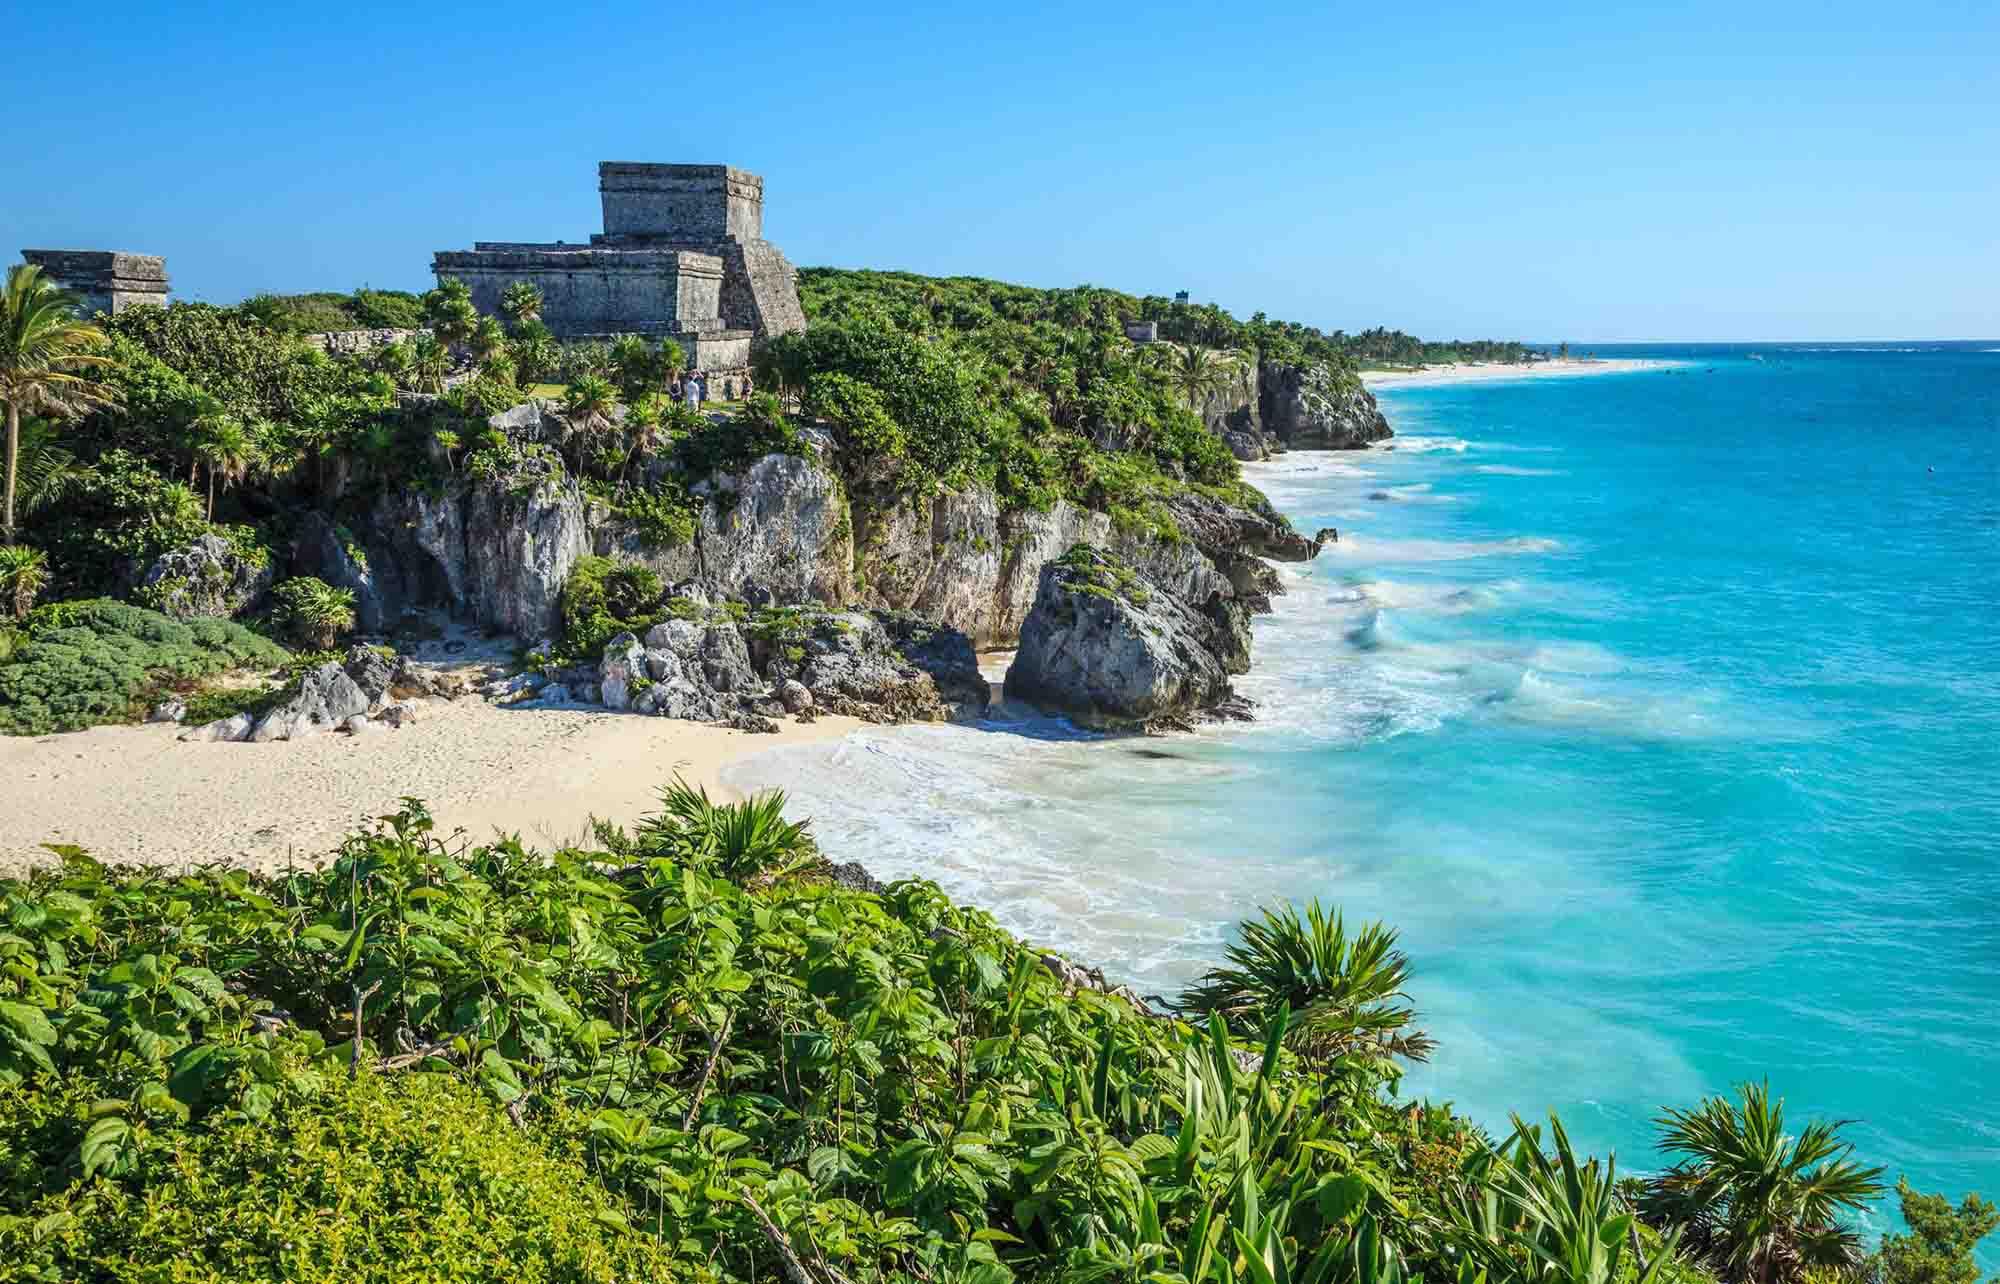 La cité maya de Tulum, une merveille en bord de mer !